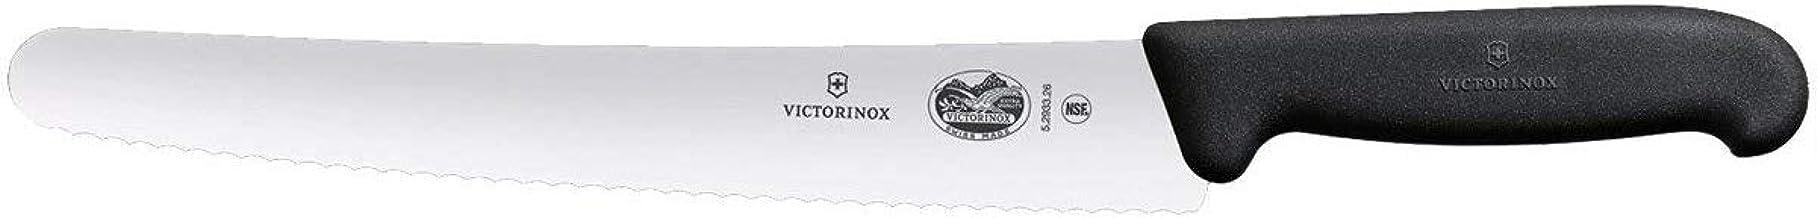 Victorinox Fibrox Handled Pastry Knife 25cm